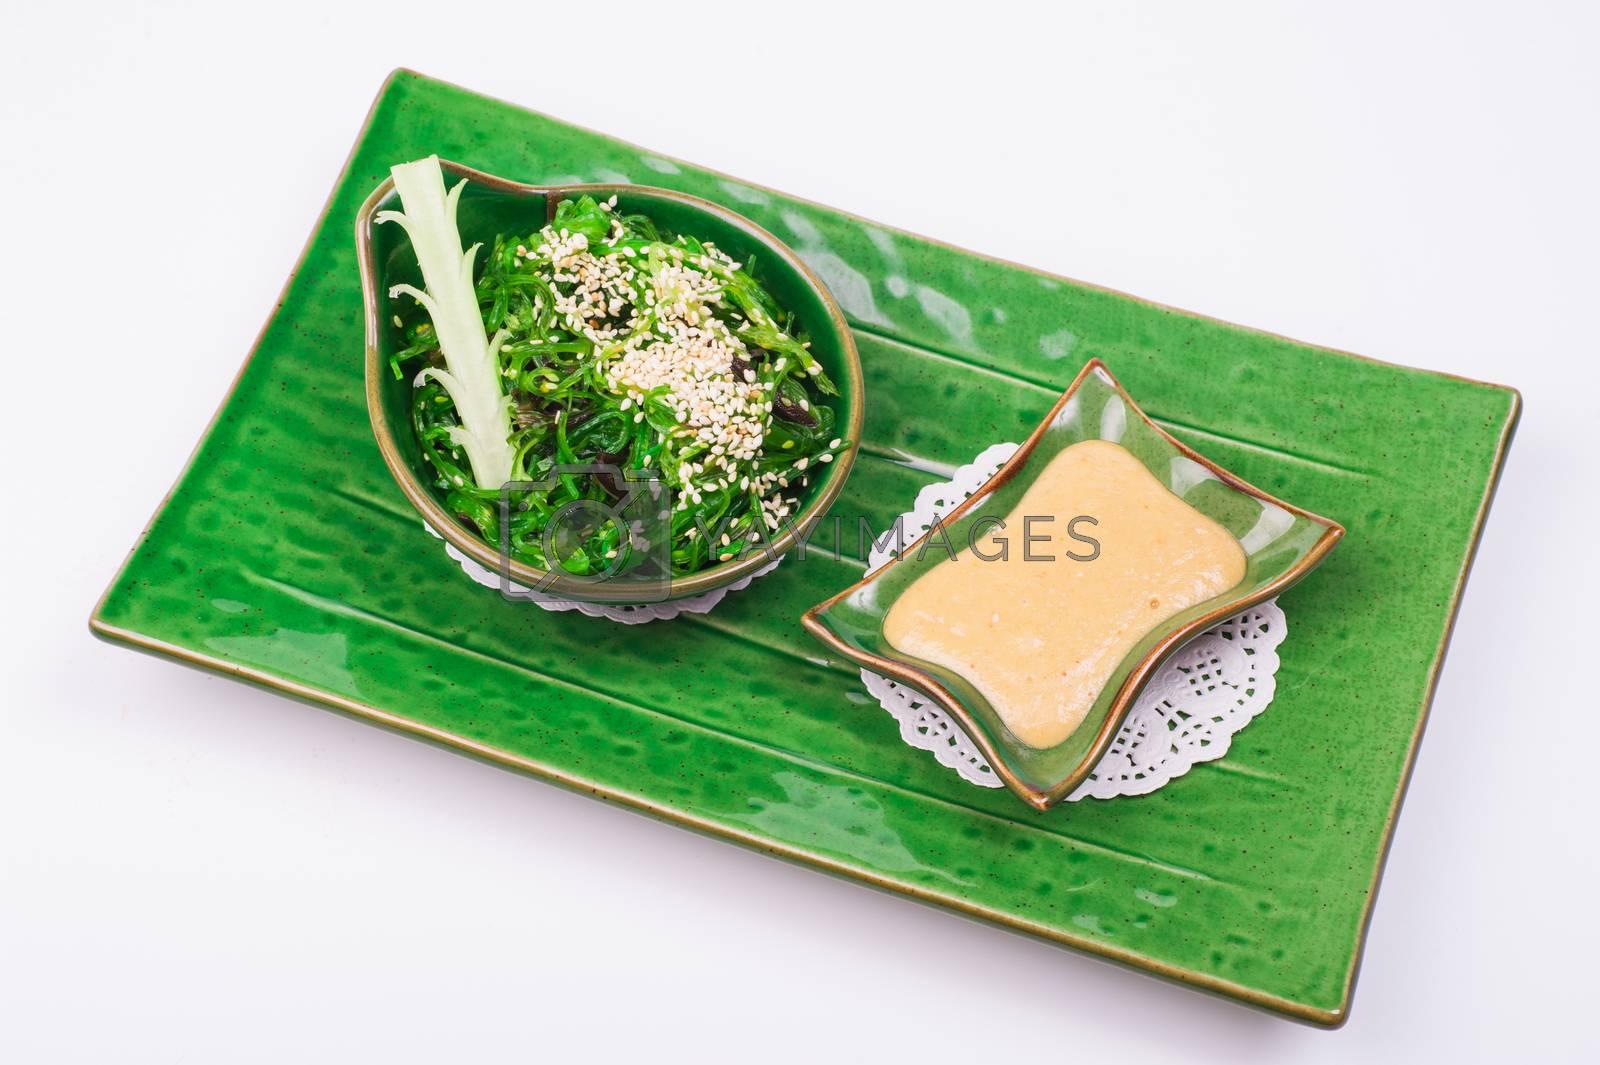 chuka salad with nut sause isolated on white background